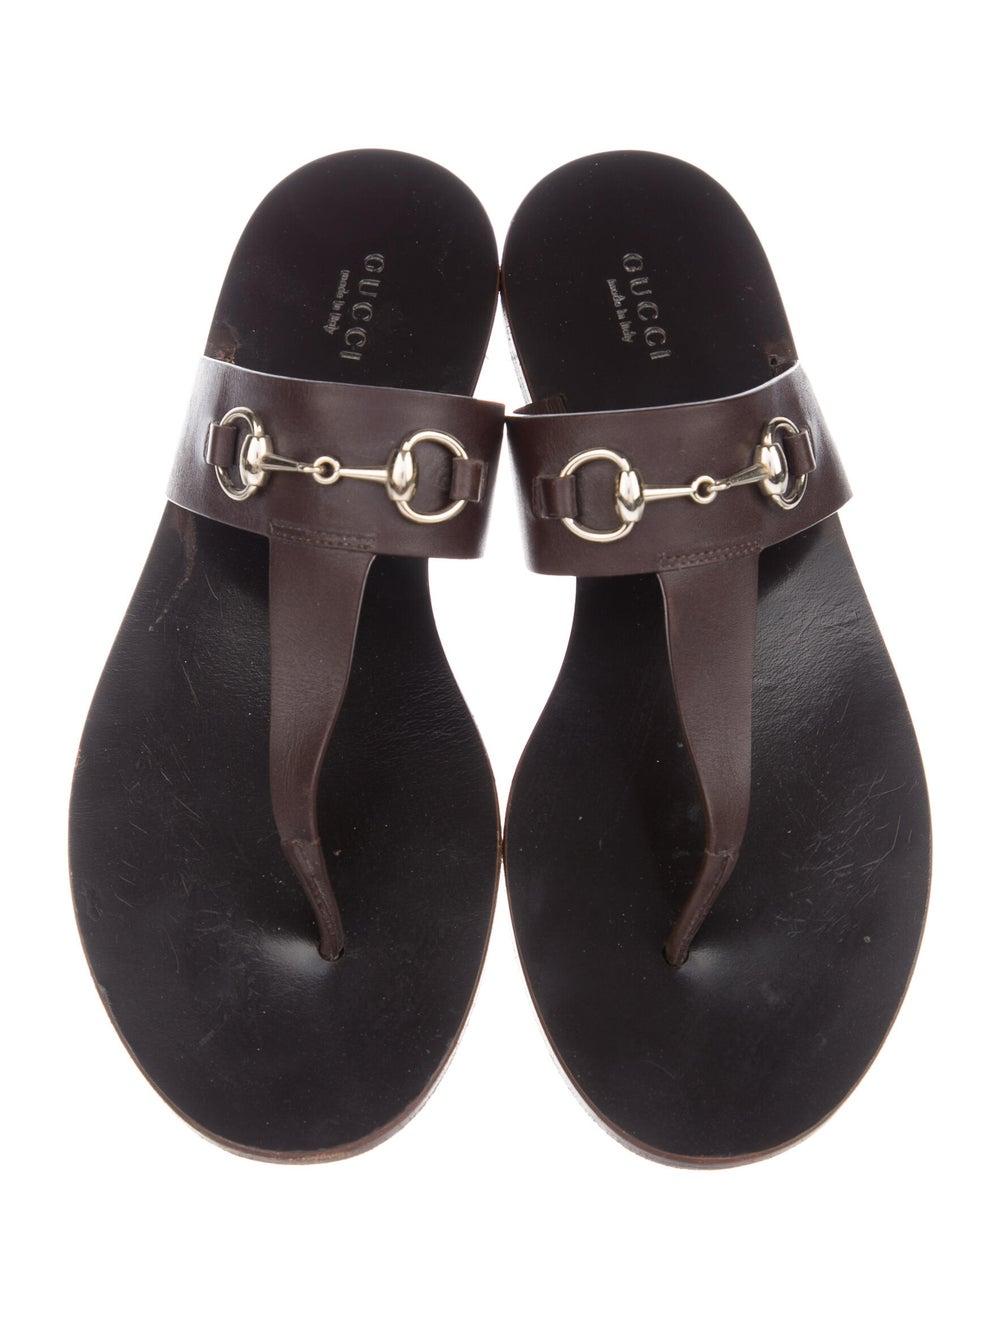 Gucci Horsebit Accent Leather Slides Brown - image 3